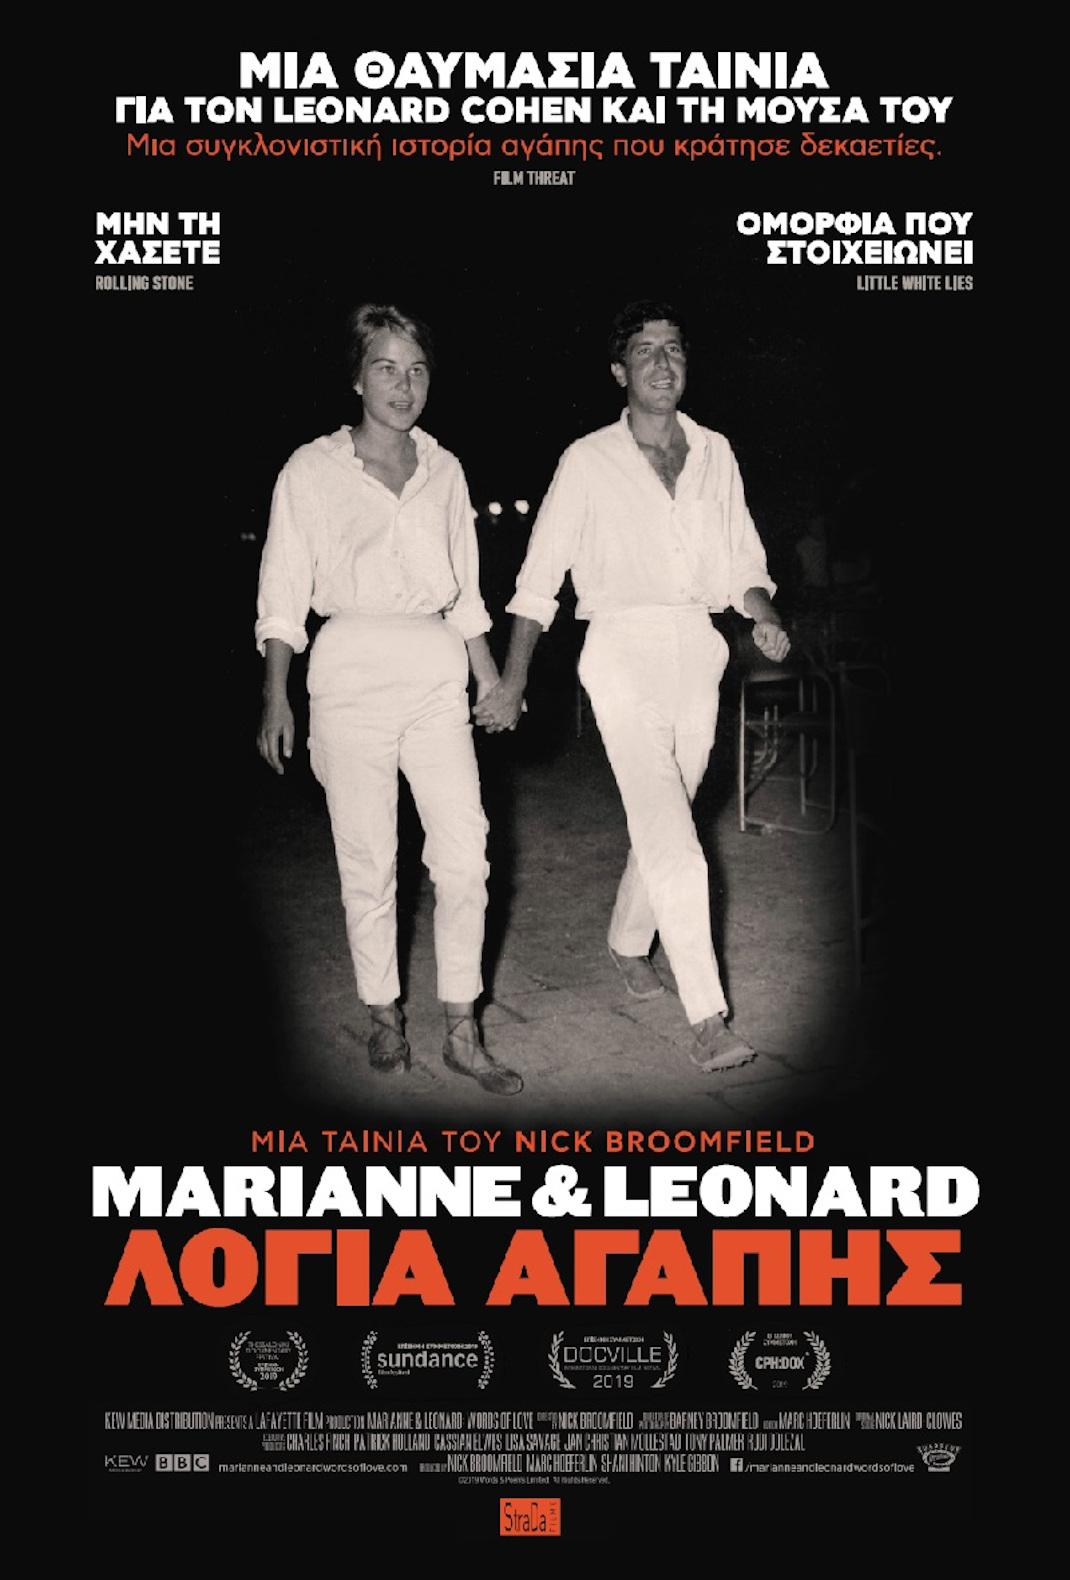 Marianne & Leonard Words of Love